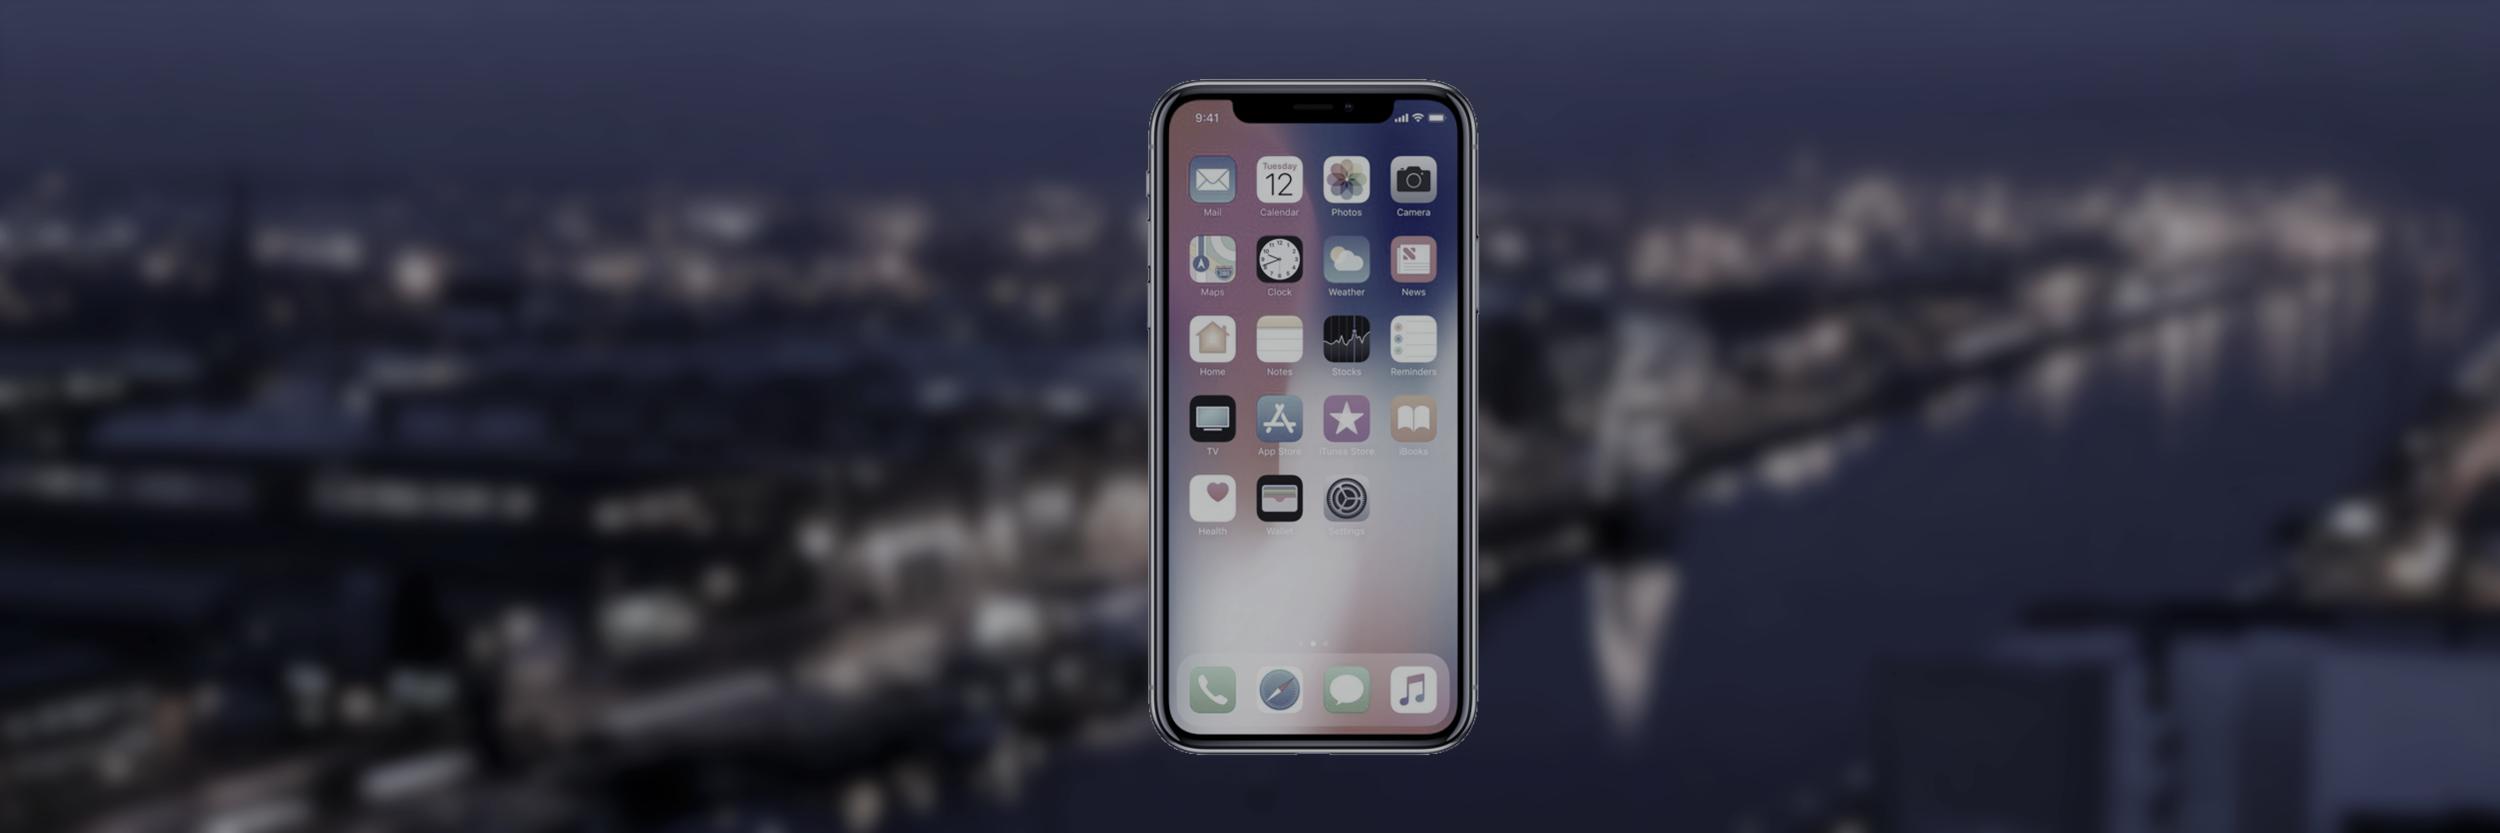 iOS Devices -